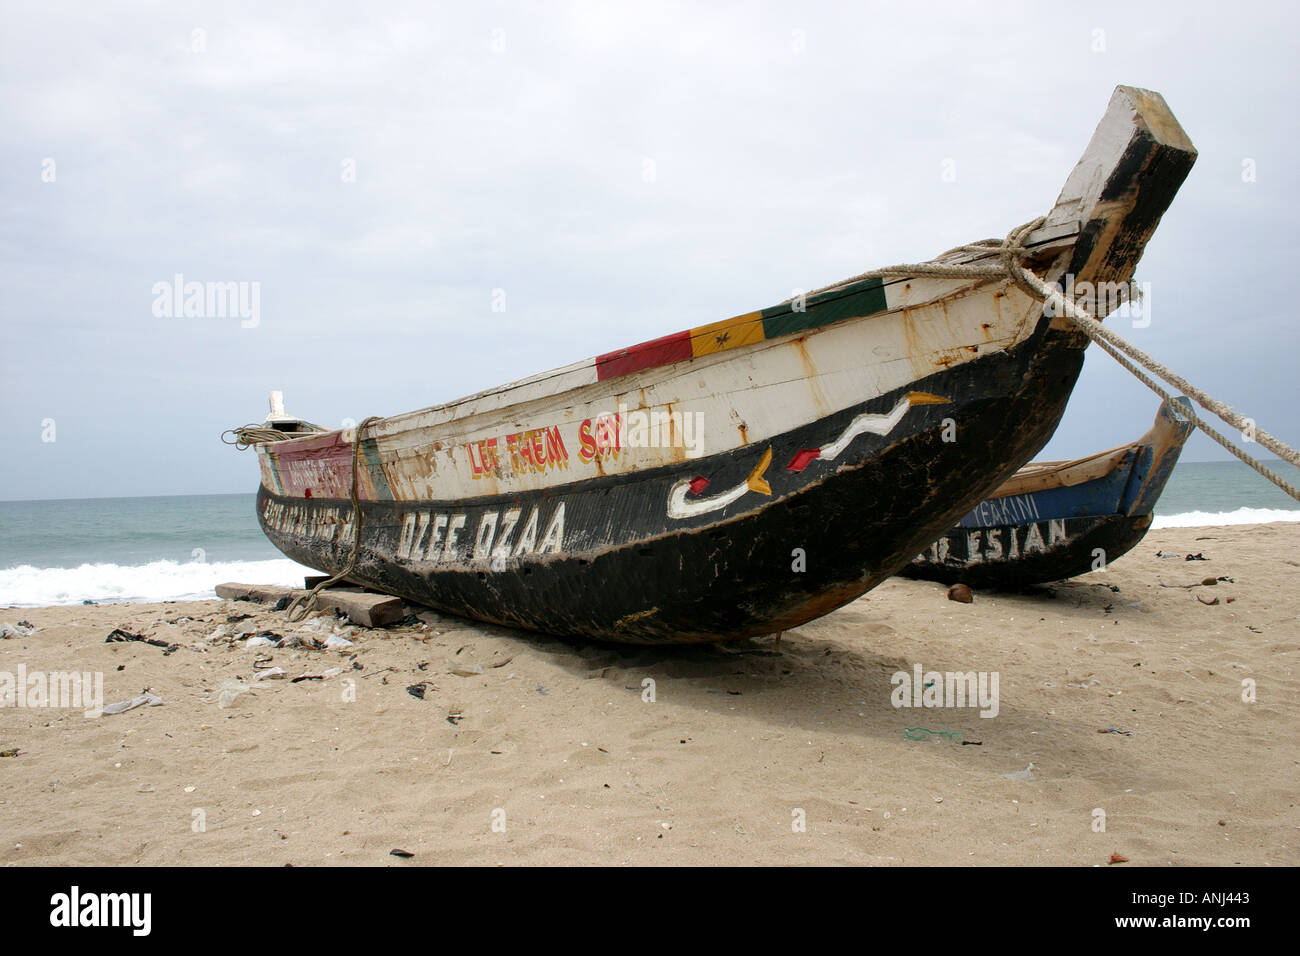 Seagoing dugout canoe parked on beach in between fishing trips Winneba Ghana - Stock Image